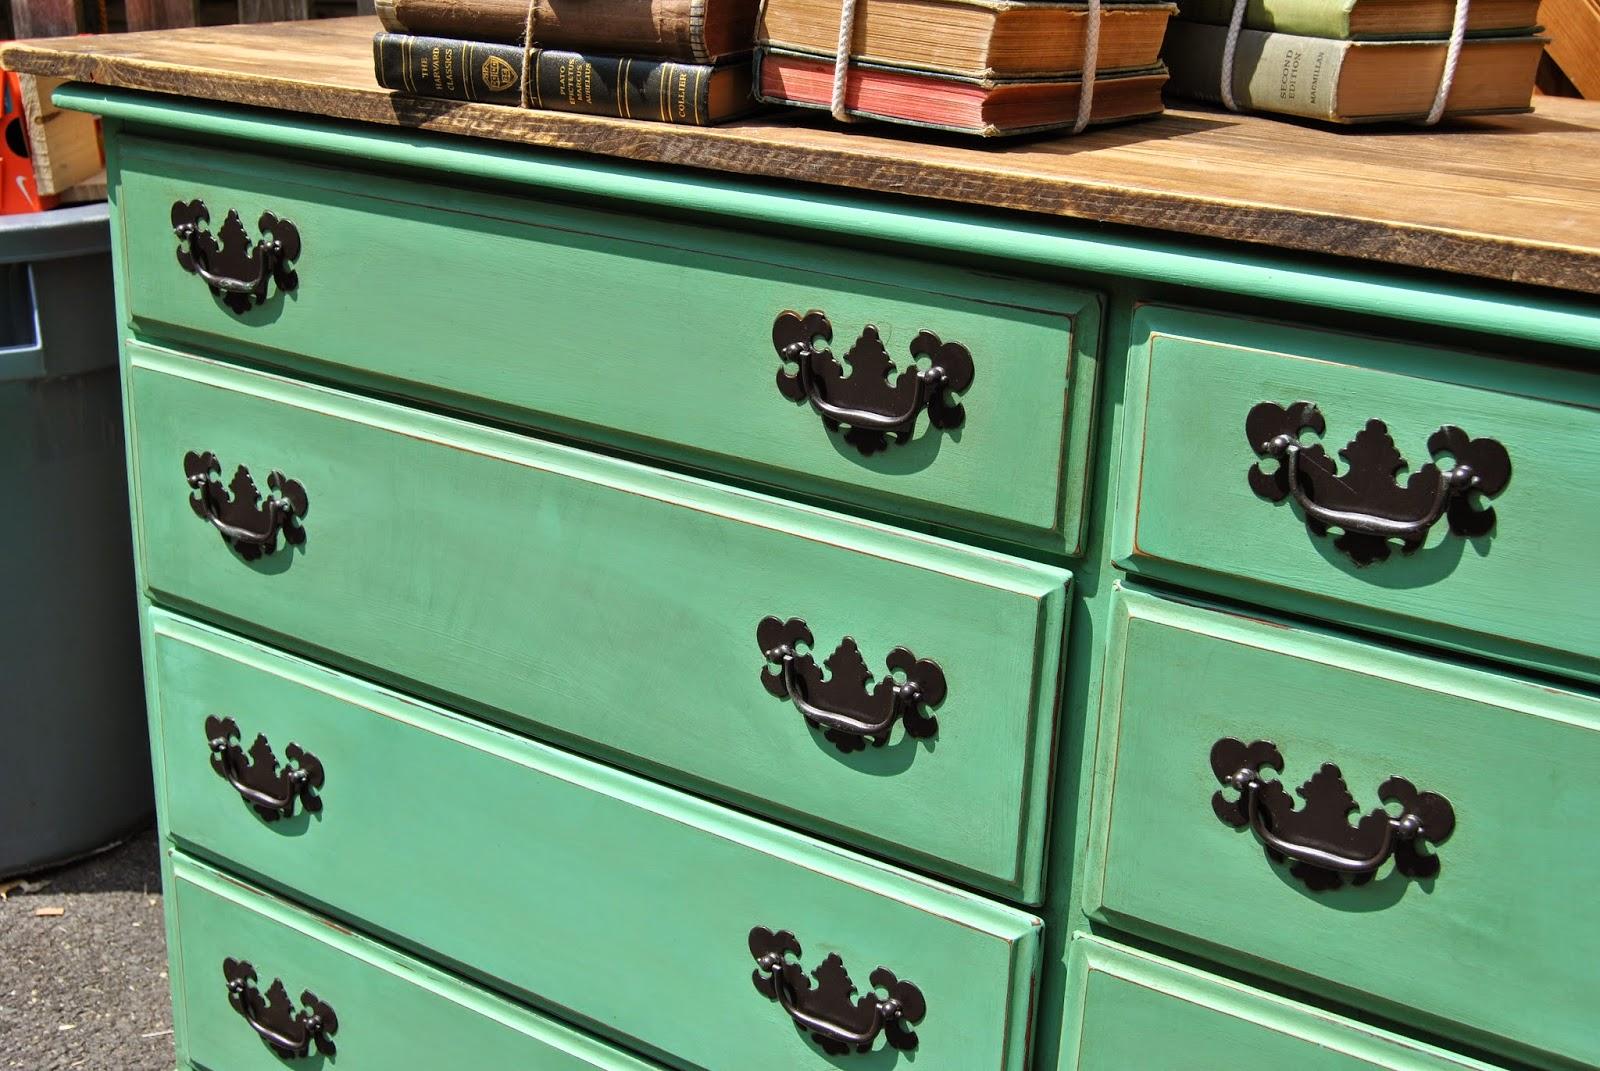 Turn A Dresser Into A Kitchen Island: Turn A Dresser Into A Kitchen Island